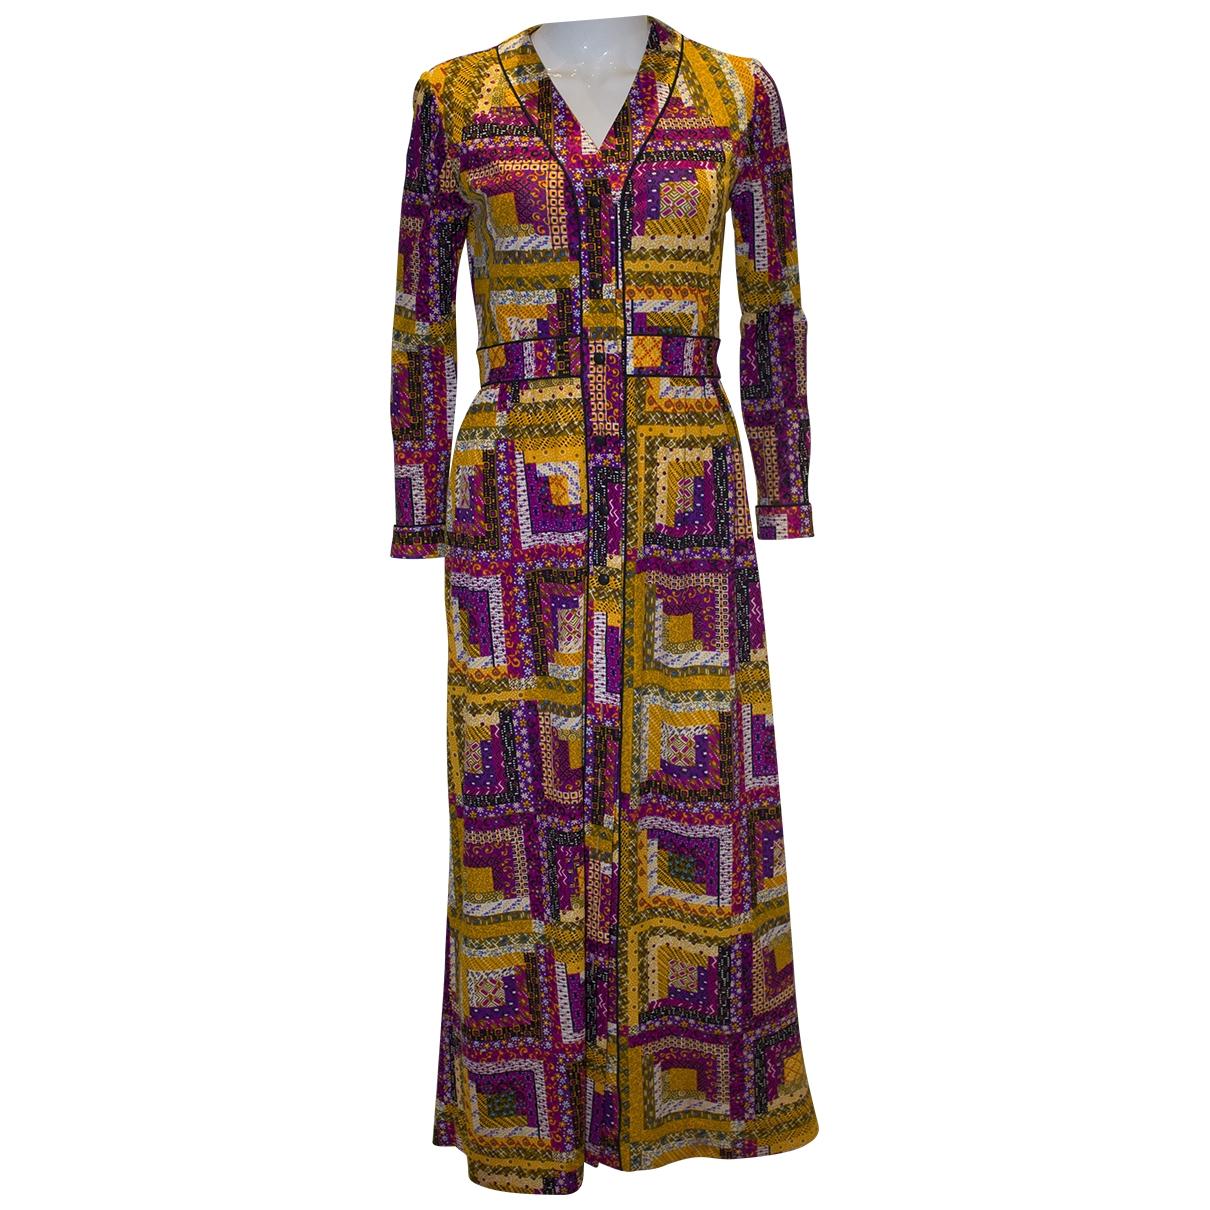 Fiorenza \N Kleid in  Bunt Synthetik